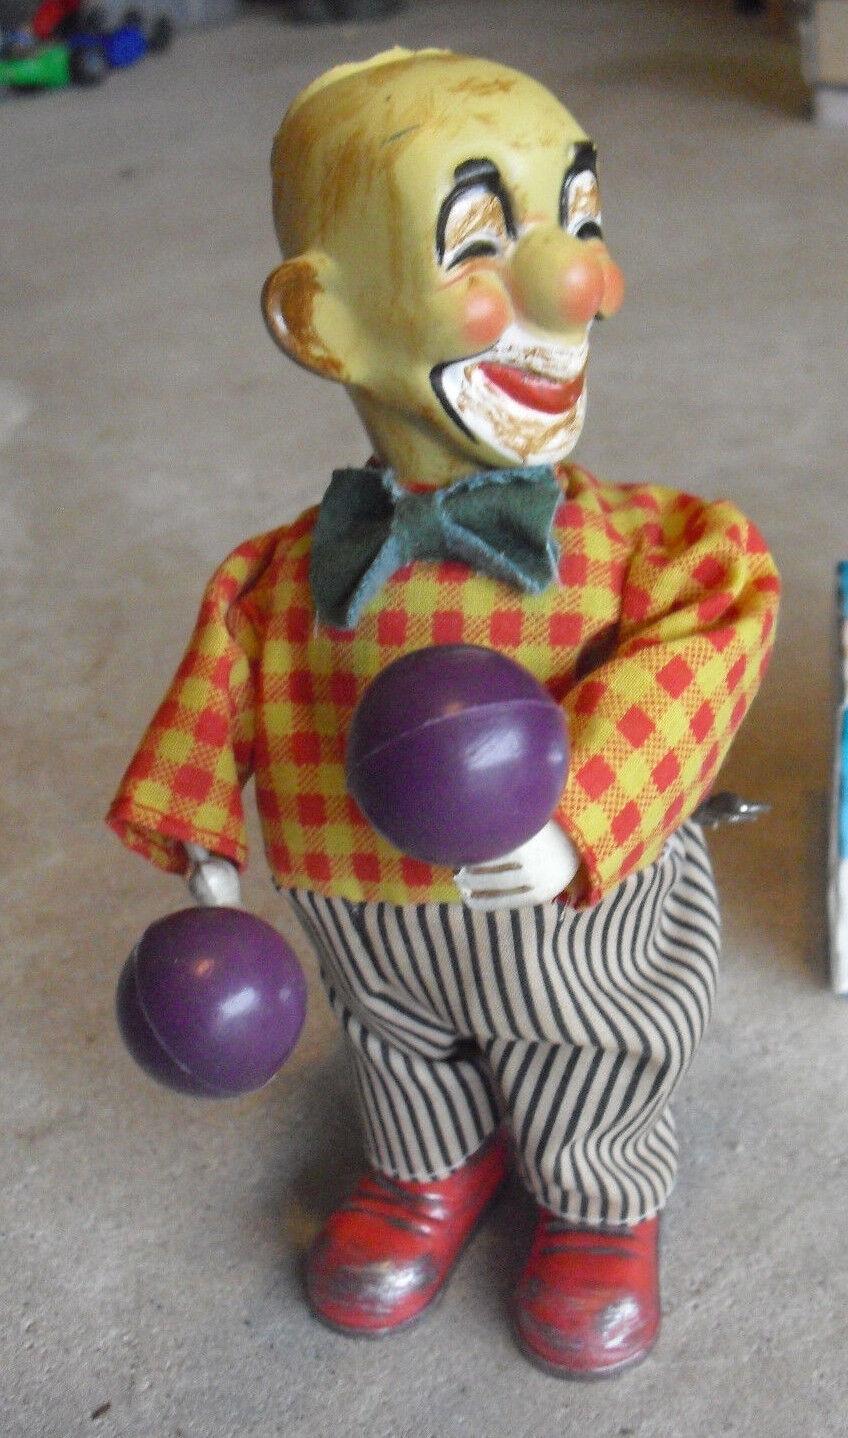 ODD  Vintage 1950s Plastic Wind Up Clown Toy 6 3 4  Tall